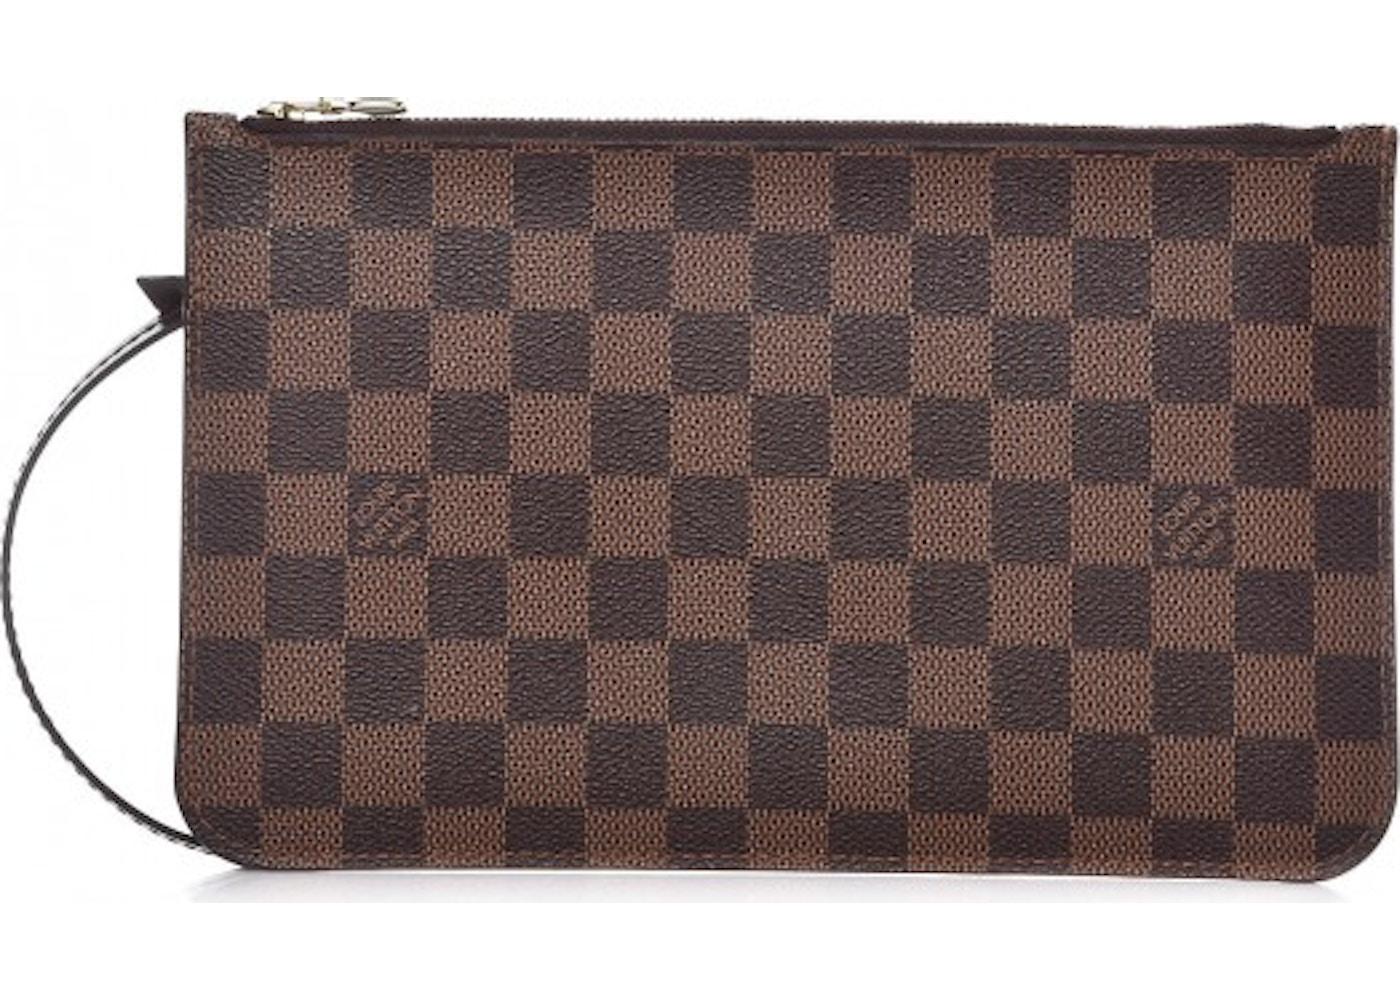 c248e0e69ed Louis Vuitton Neverfull Gm Damier Price — brad.erva-doce.info